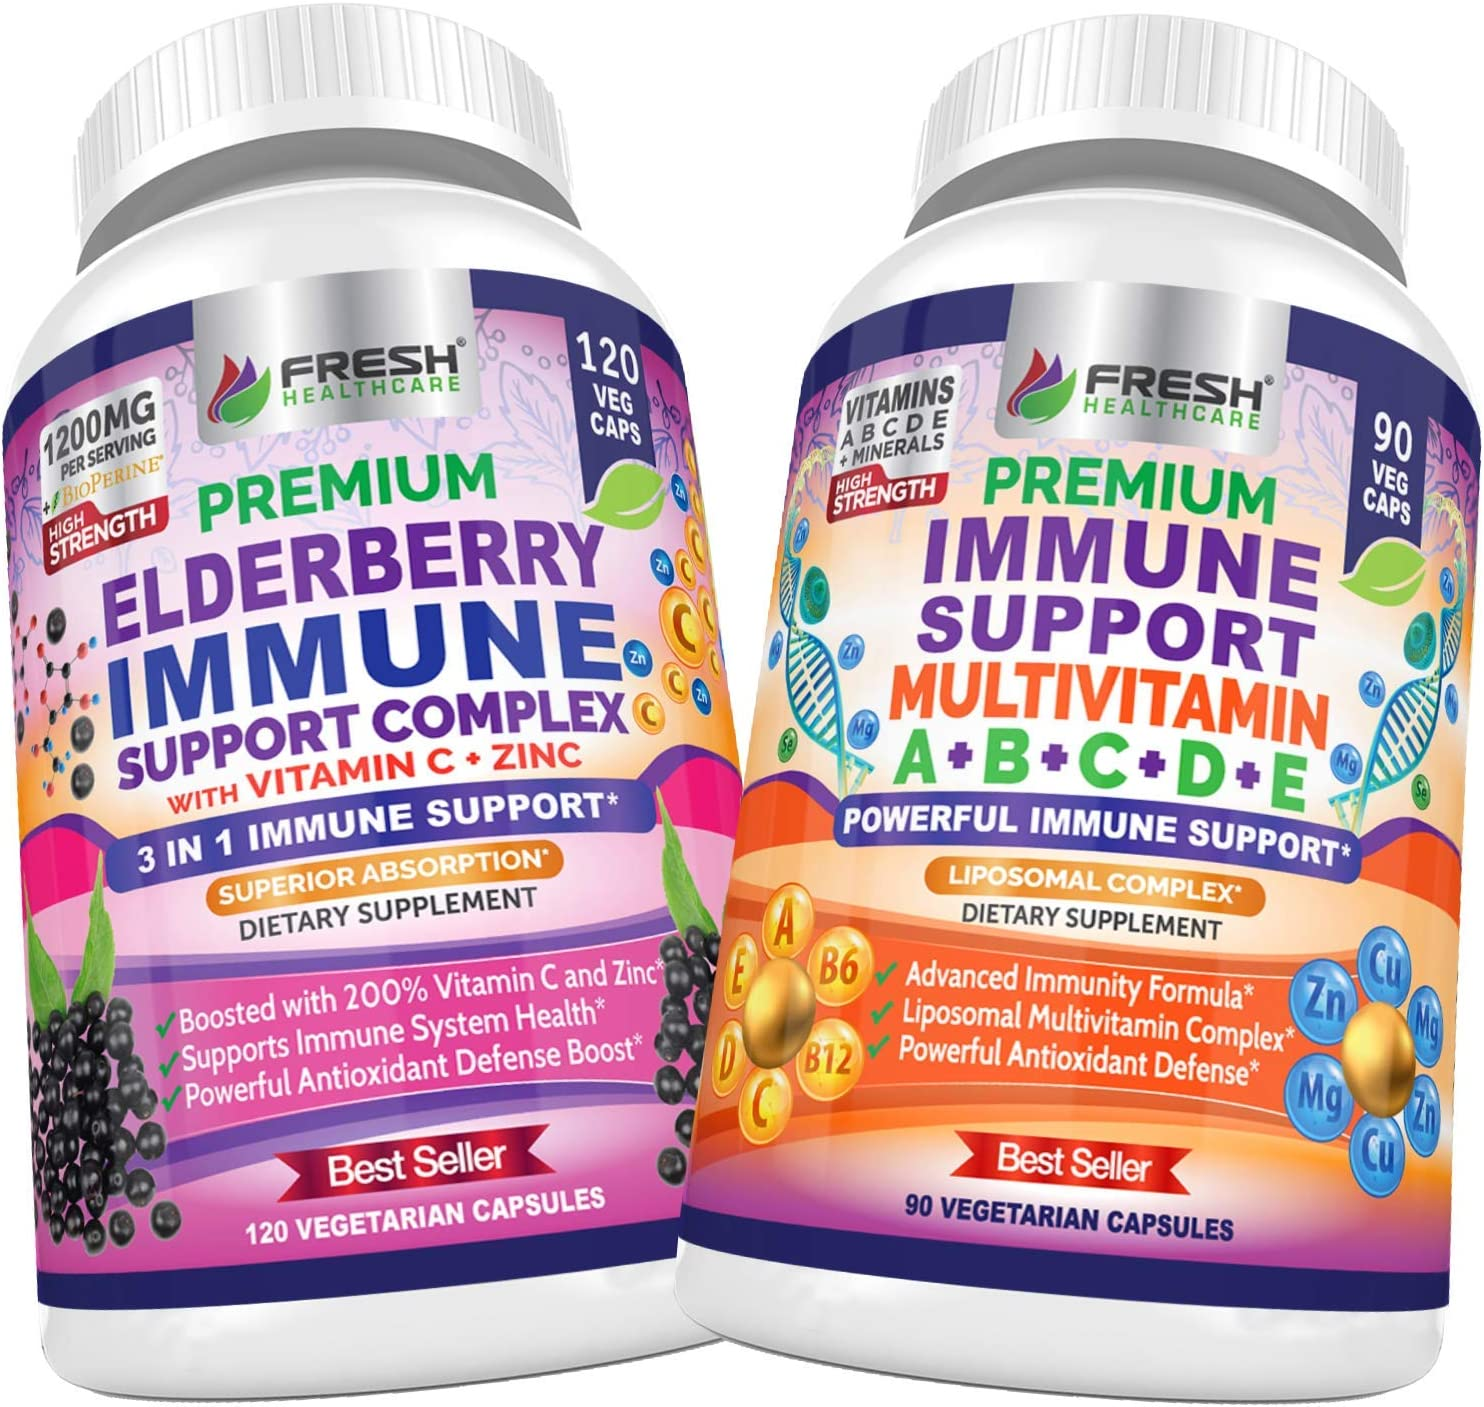 Elderberry Immune Support and Immune Support Multivitamin - Bundle